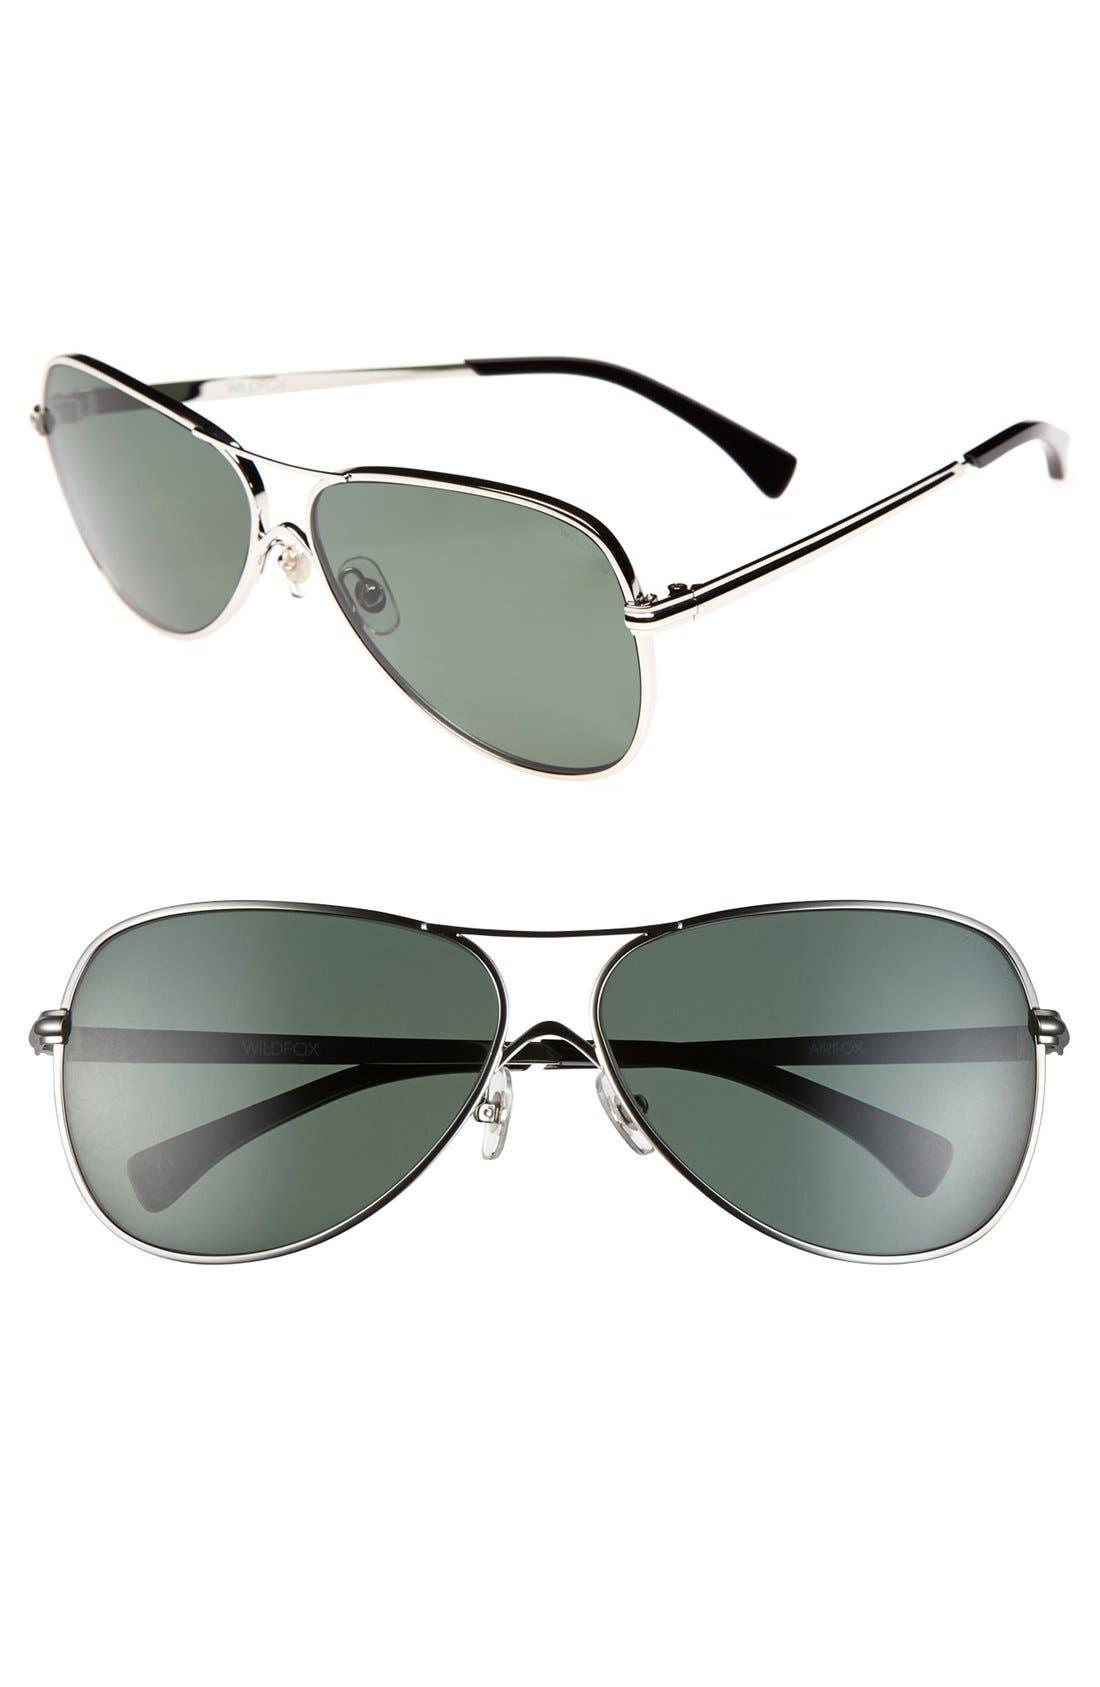 Main Image - Wildfox 'Airfox' 57mm Polarized Sunglasses